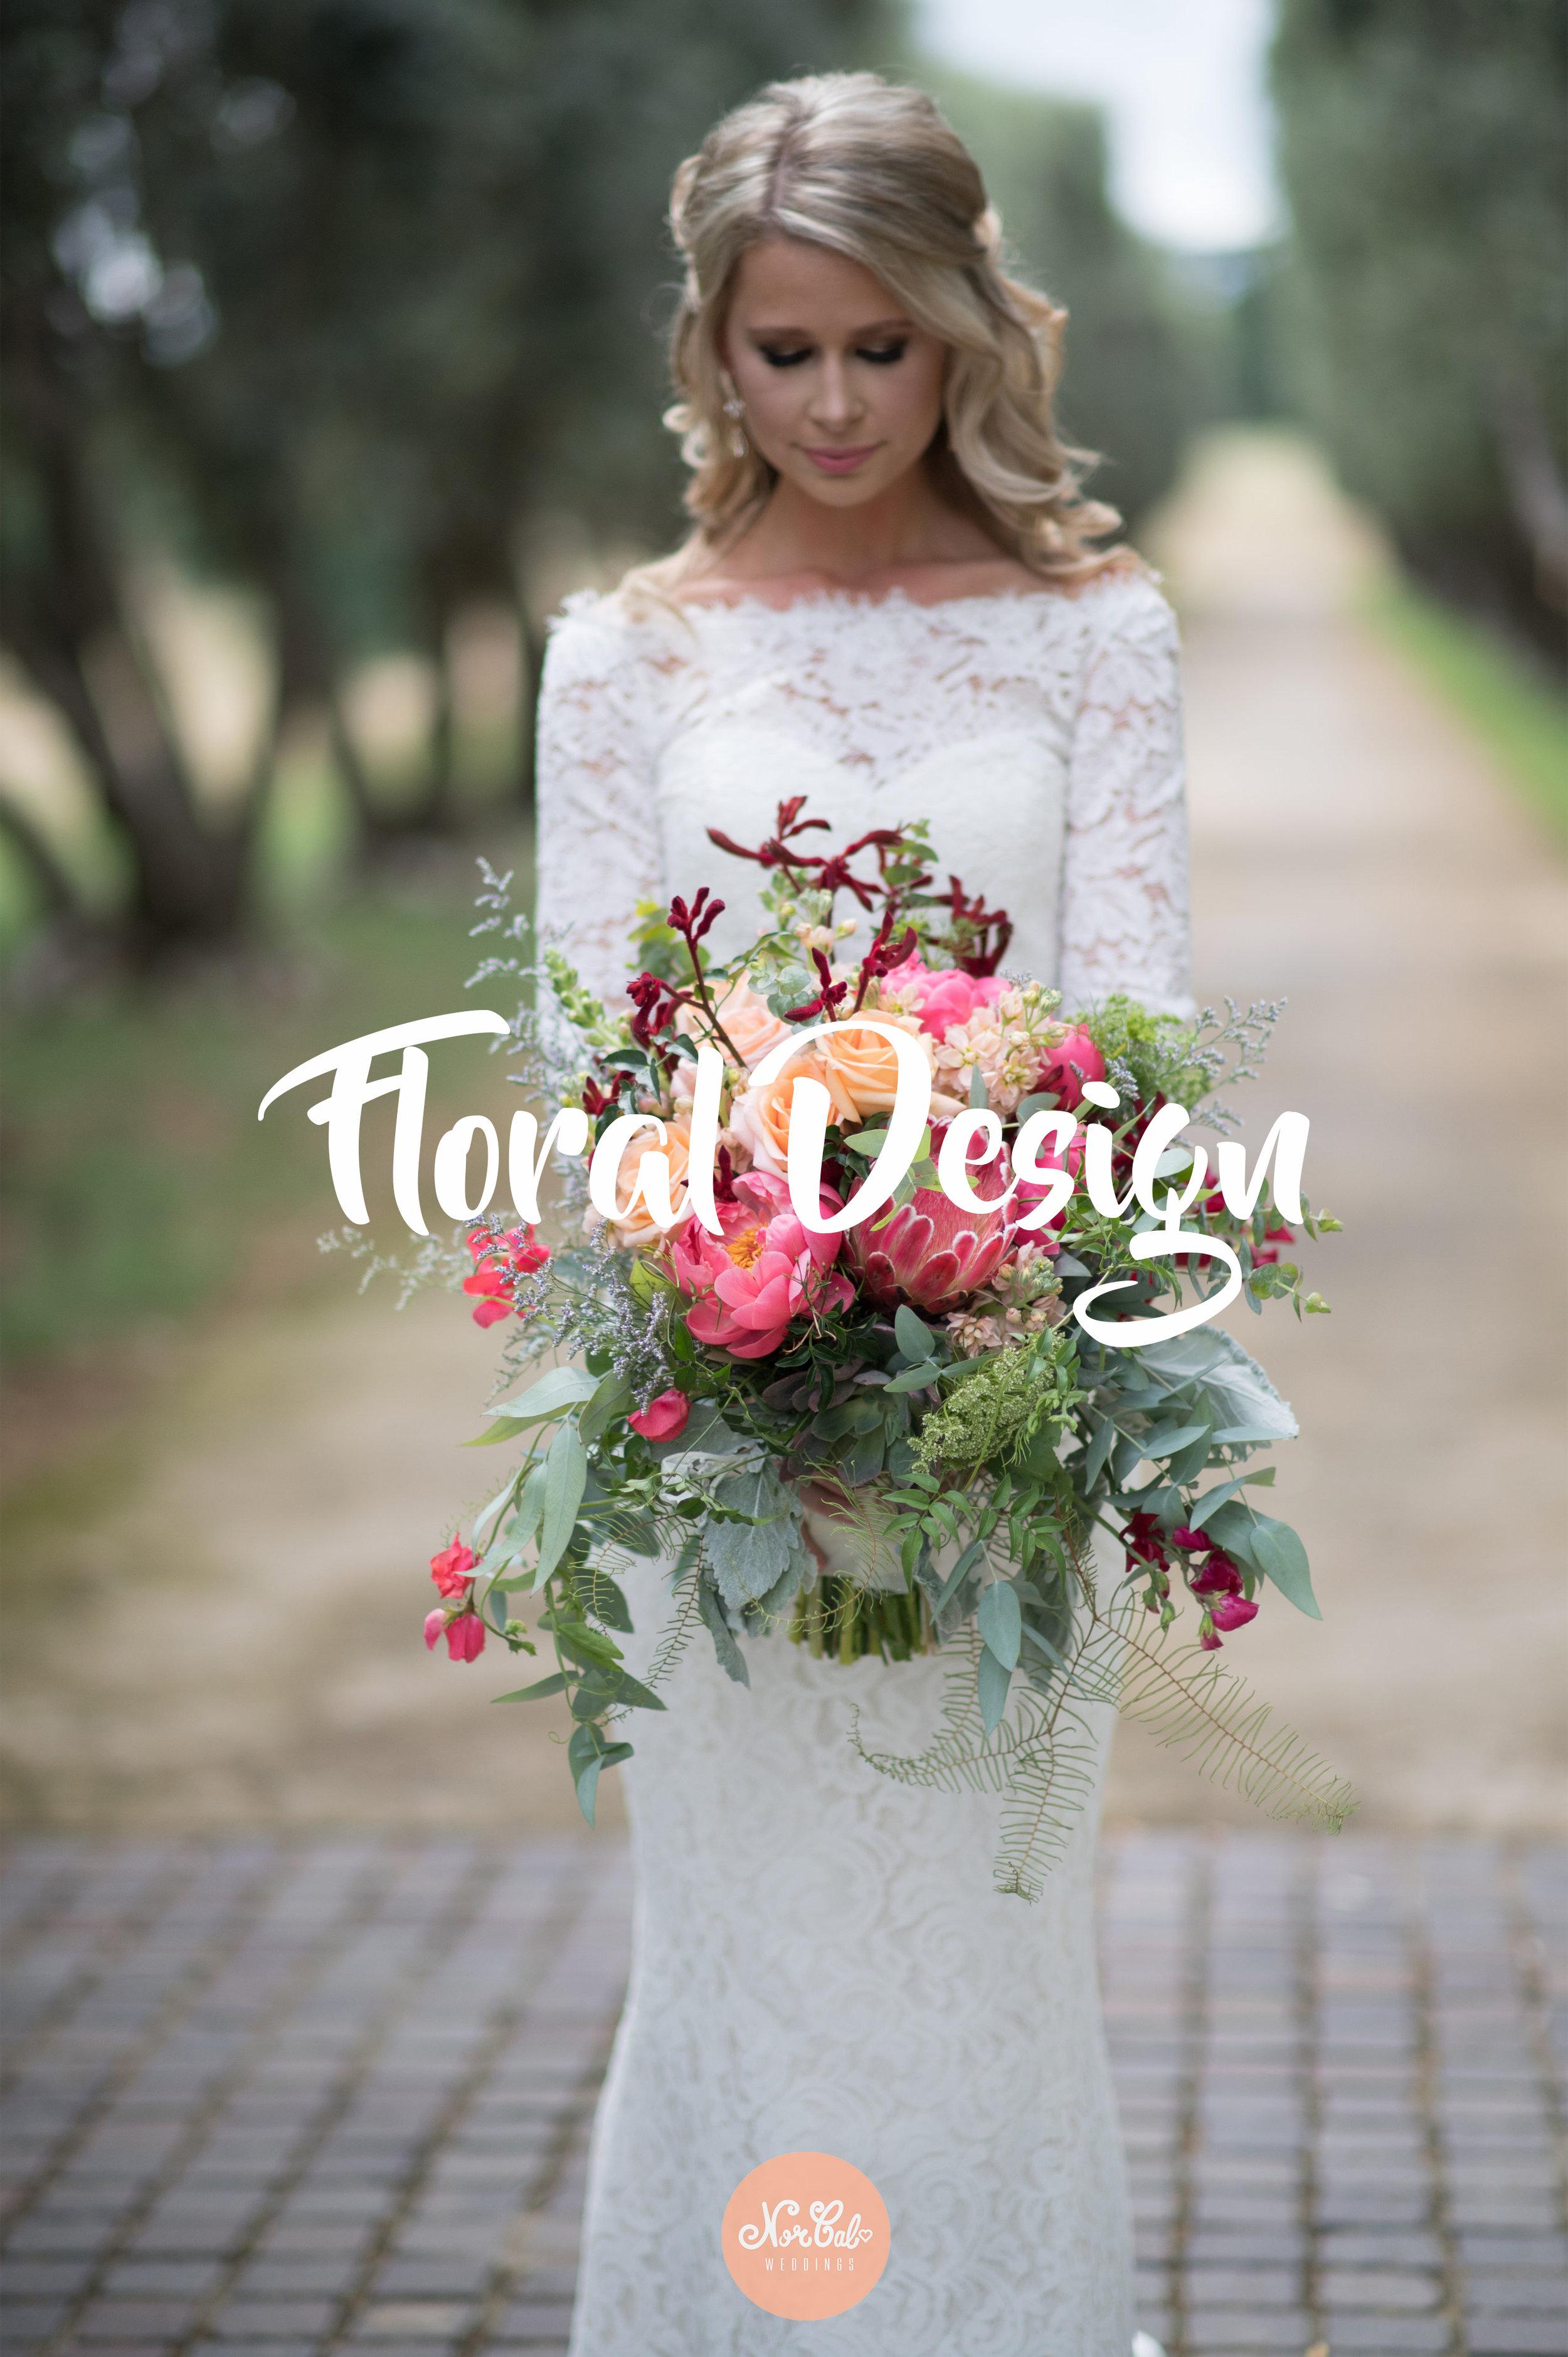 NorCal Weddings Floral Design Services.jpg